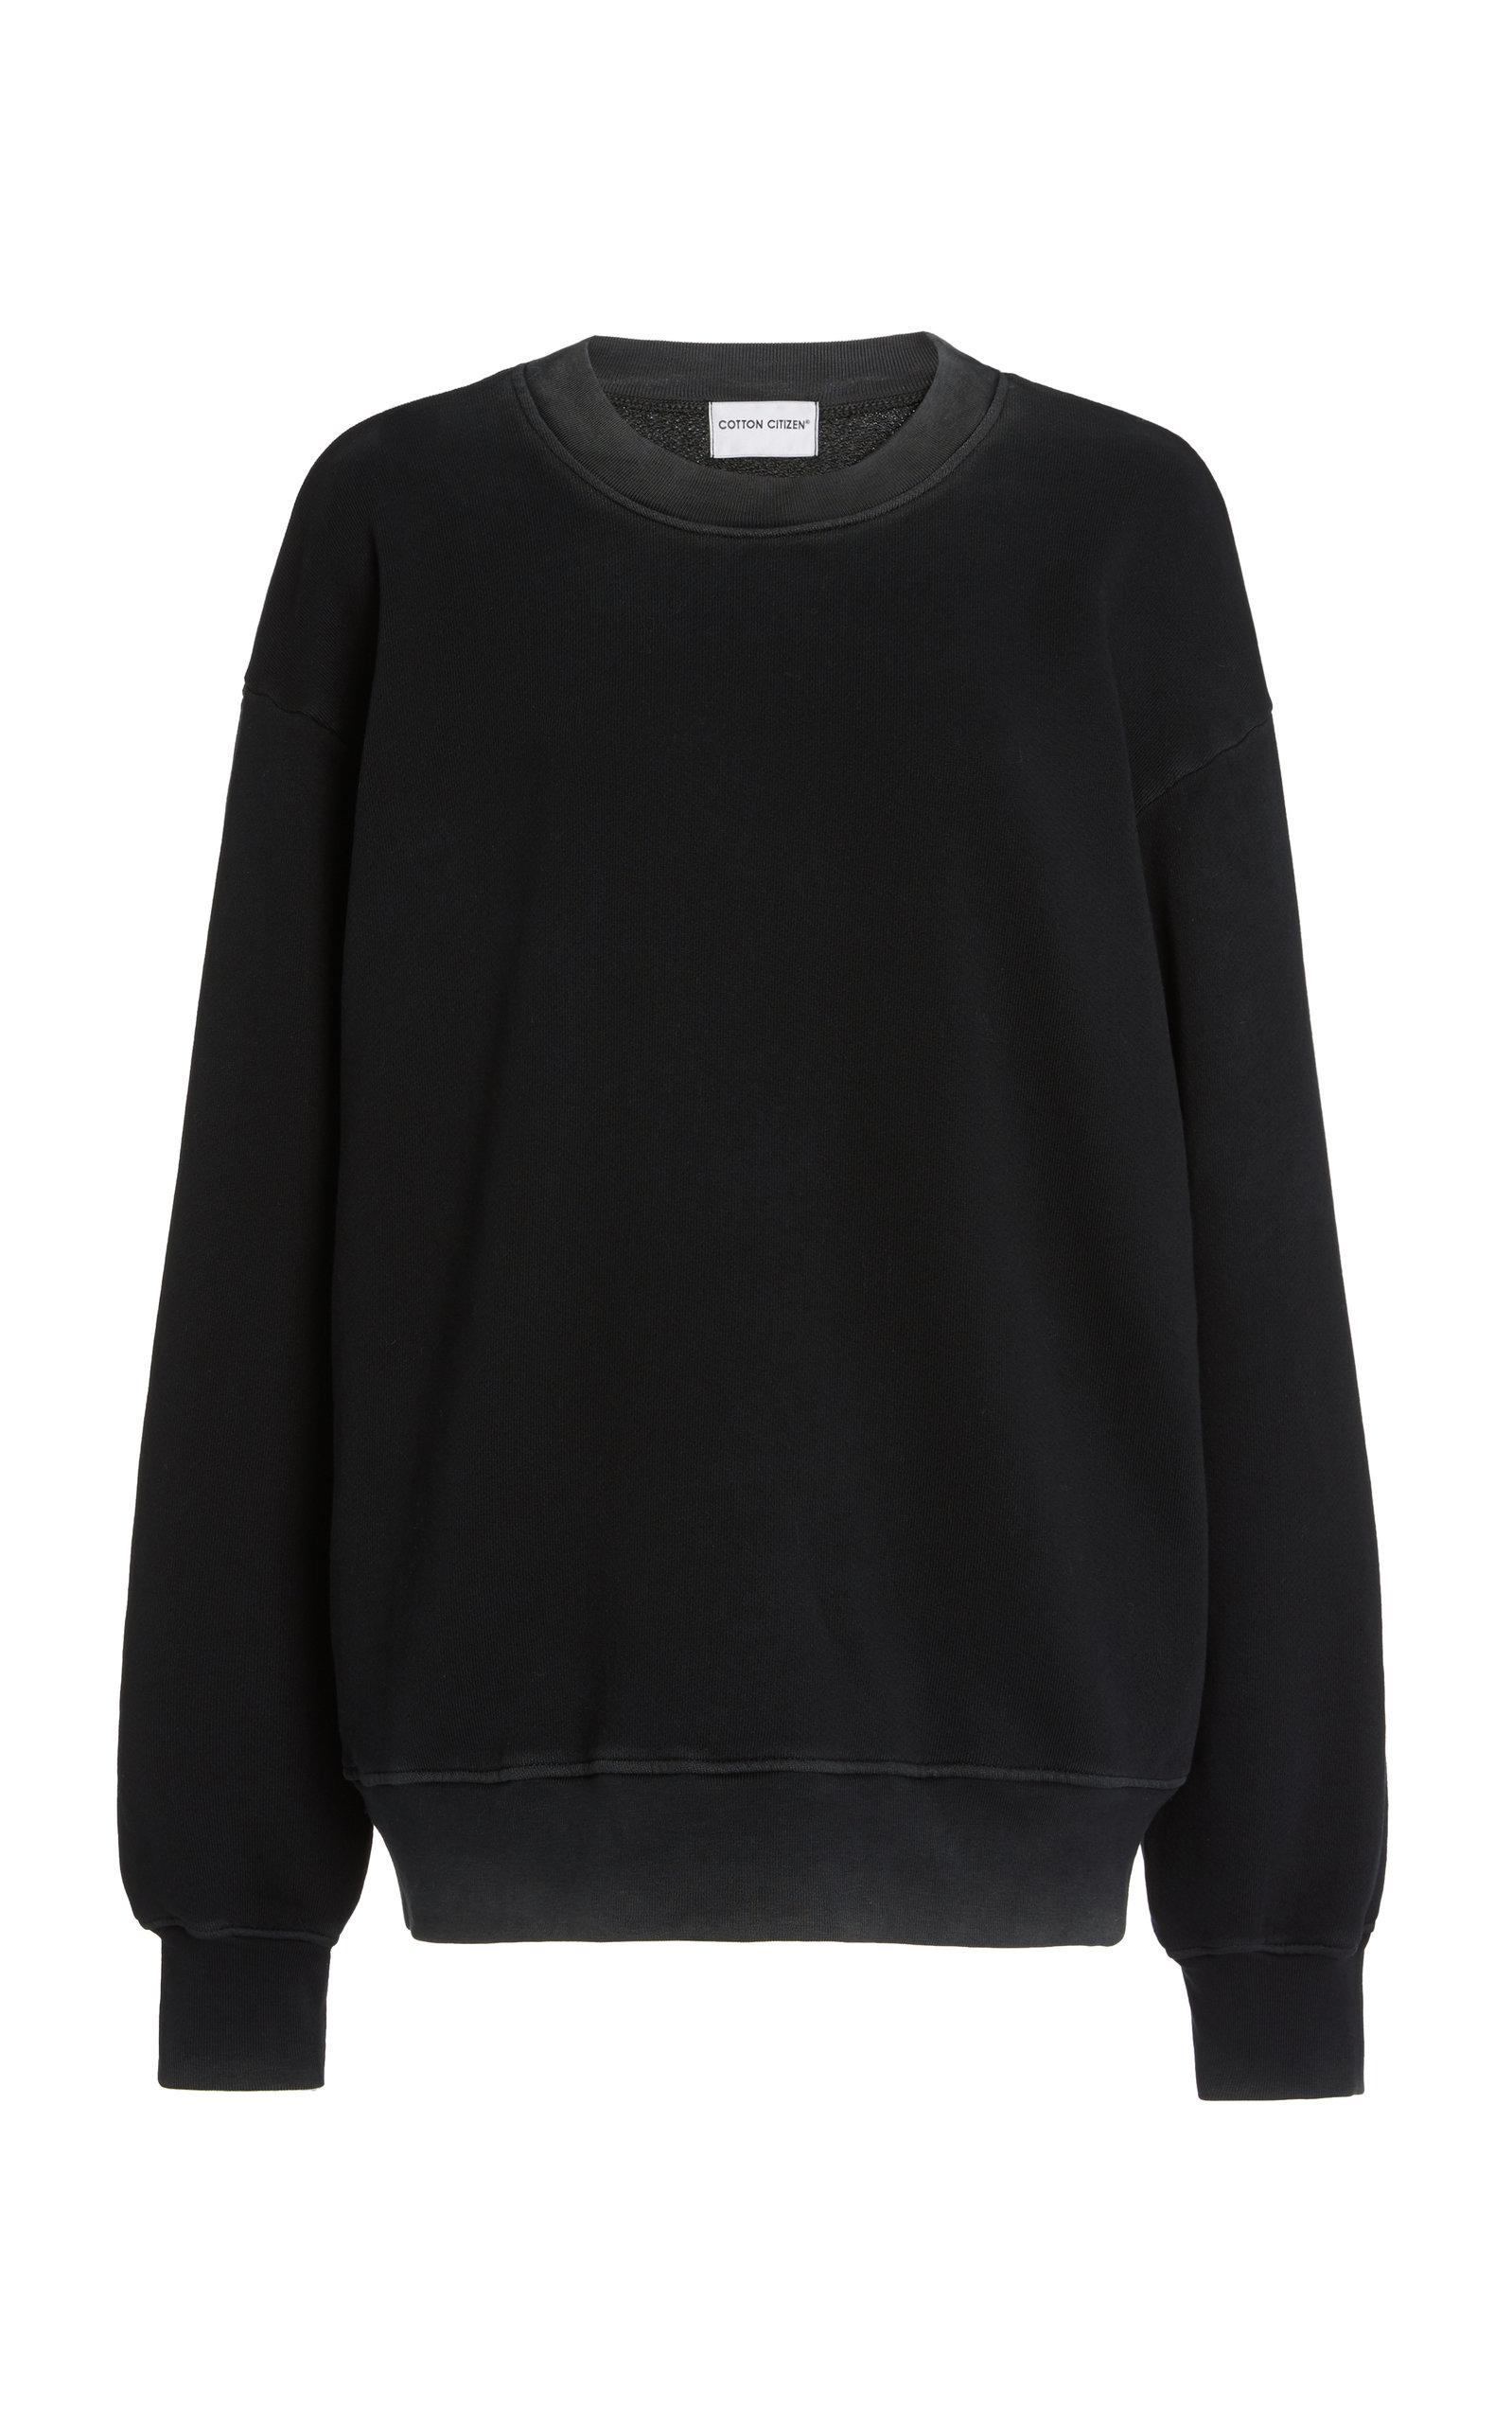 Cotton Citizen Women's The Brooklyn Oversized Washed Cotton Sweatshirt In Vintage Black